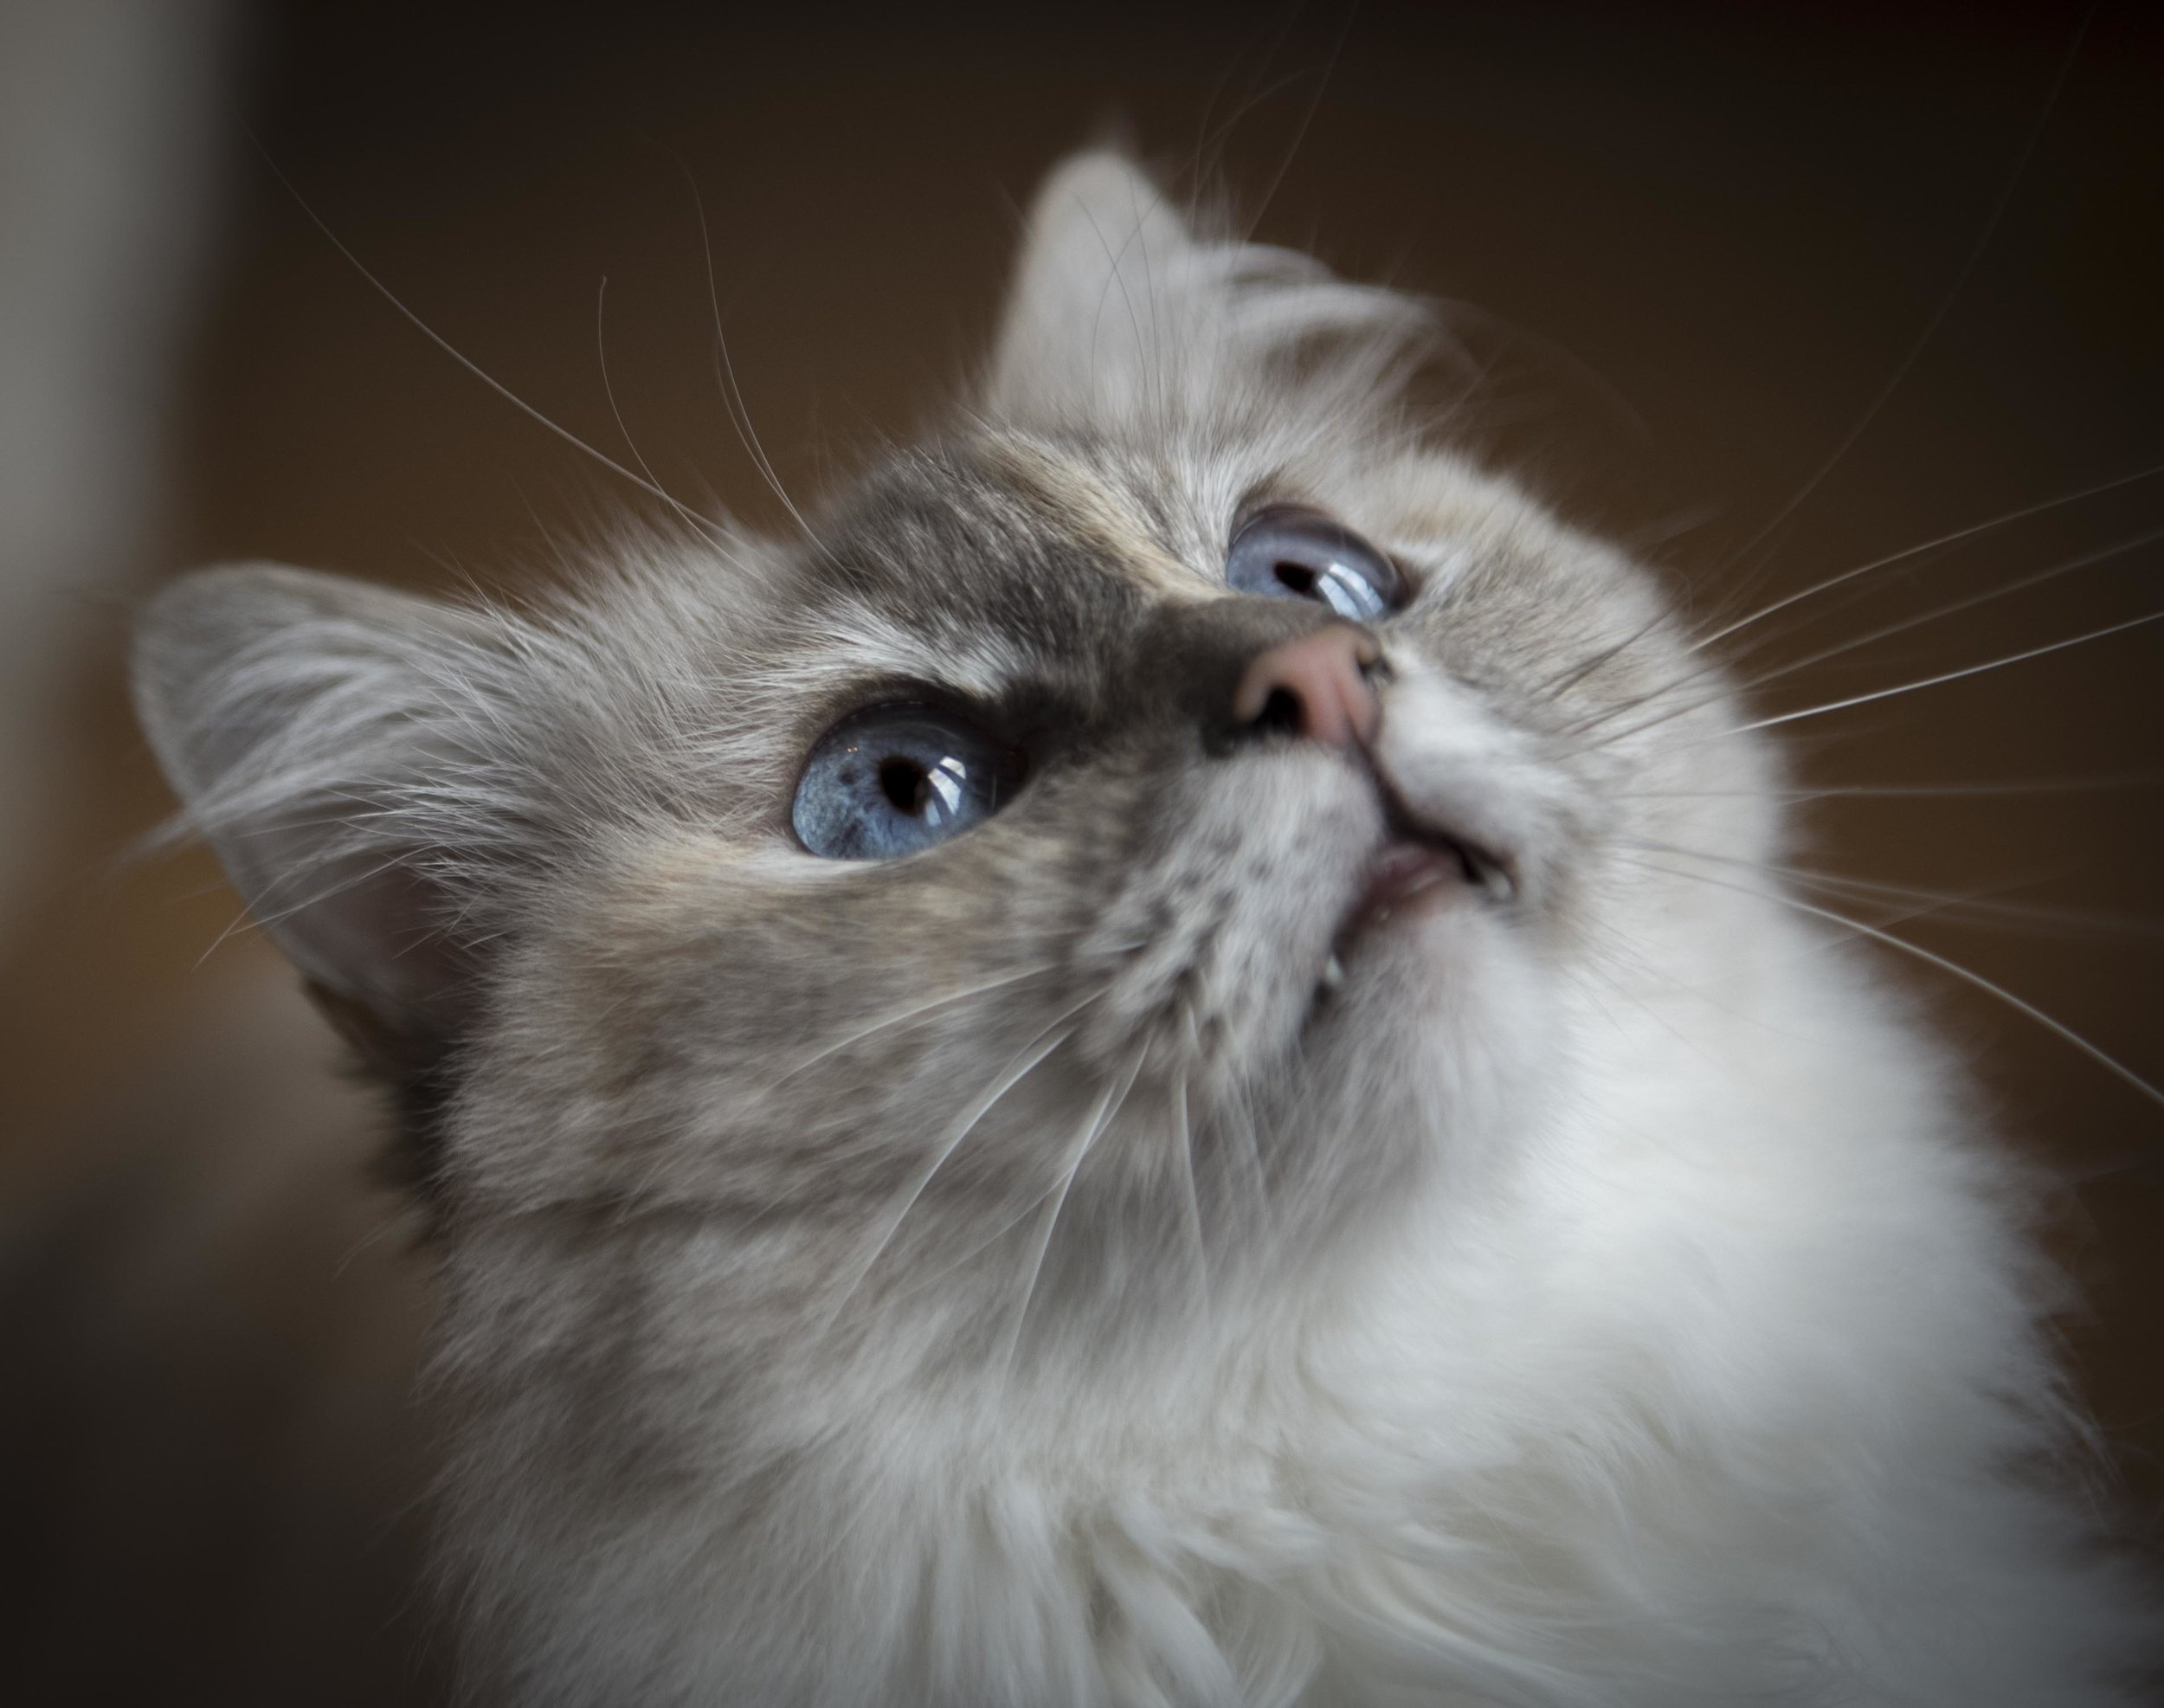 Kennedy cat